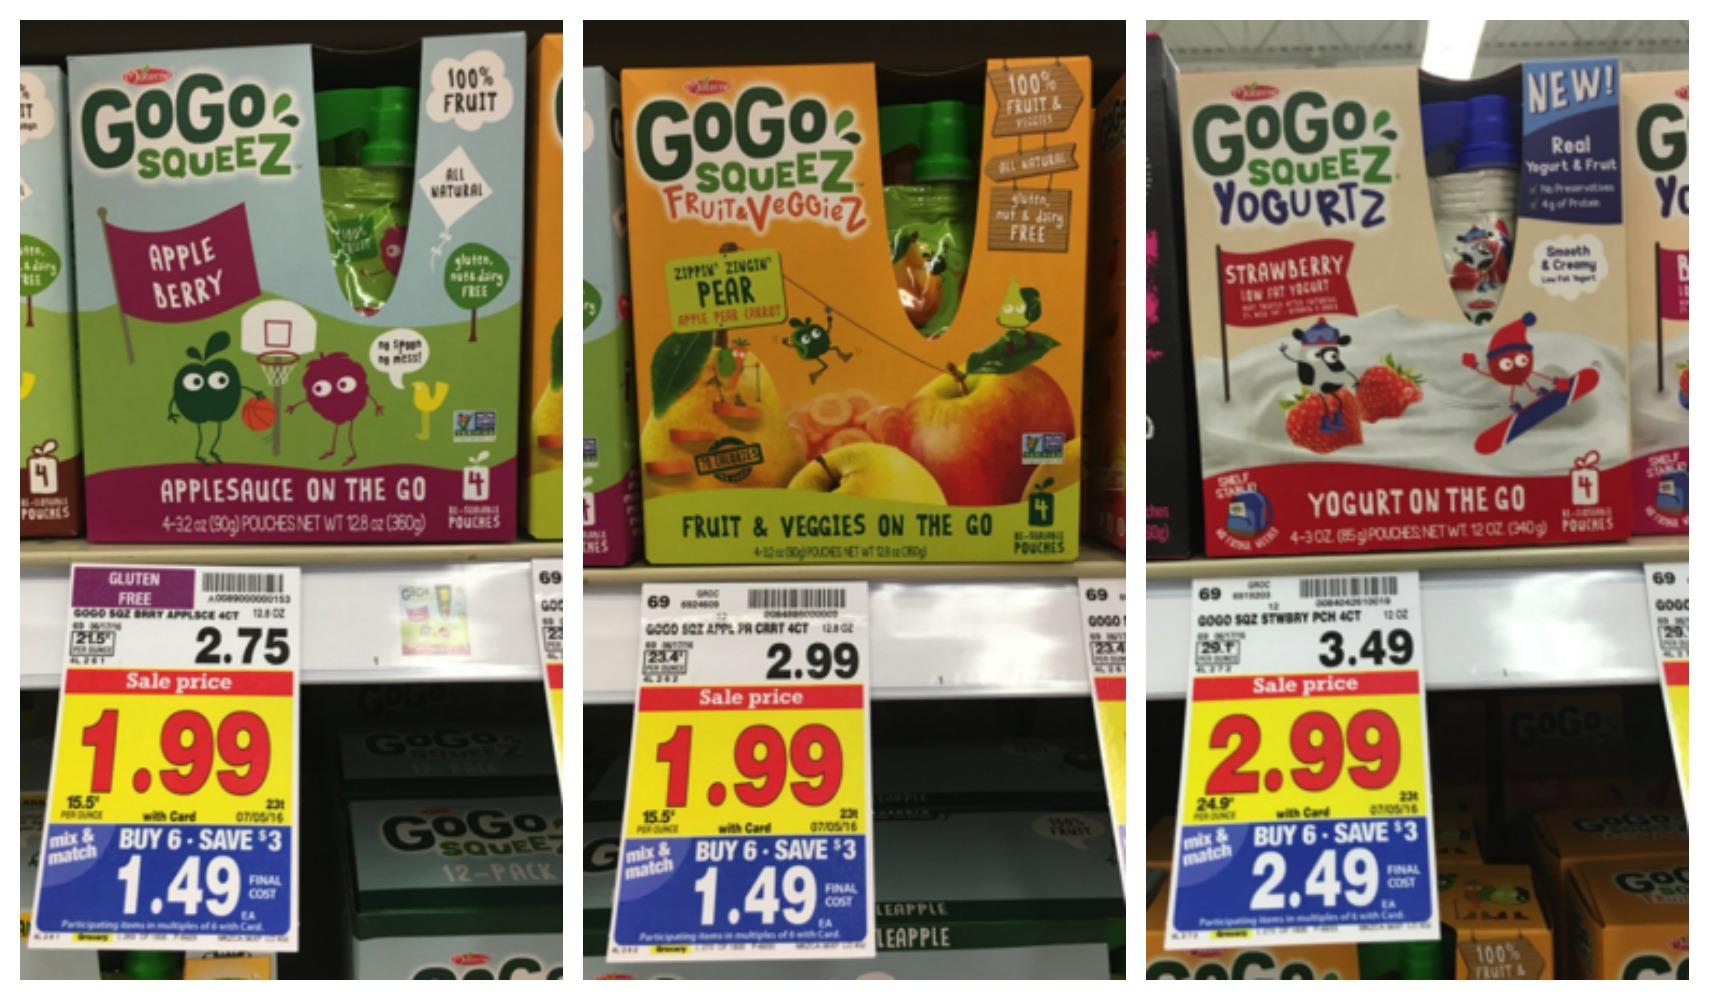 GoGo Squeeze collage